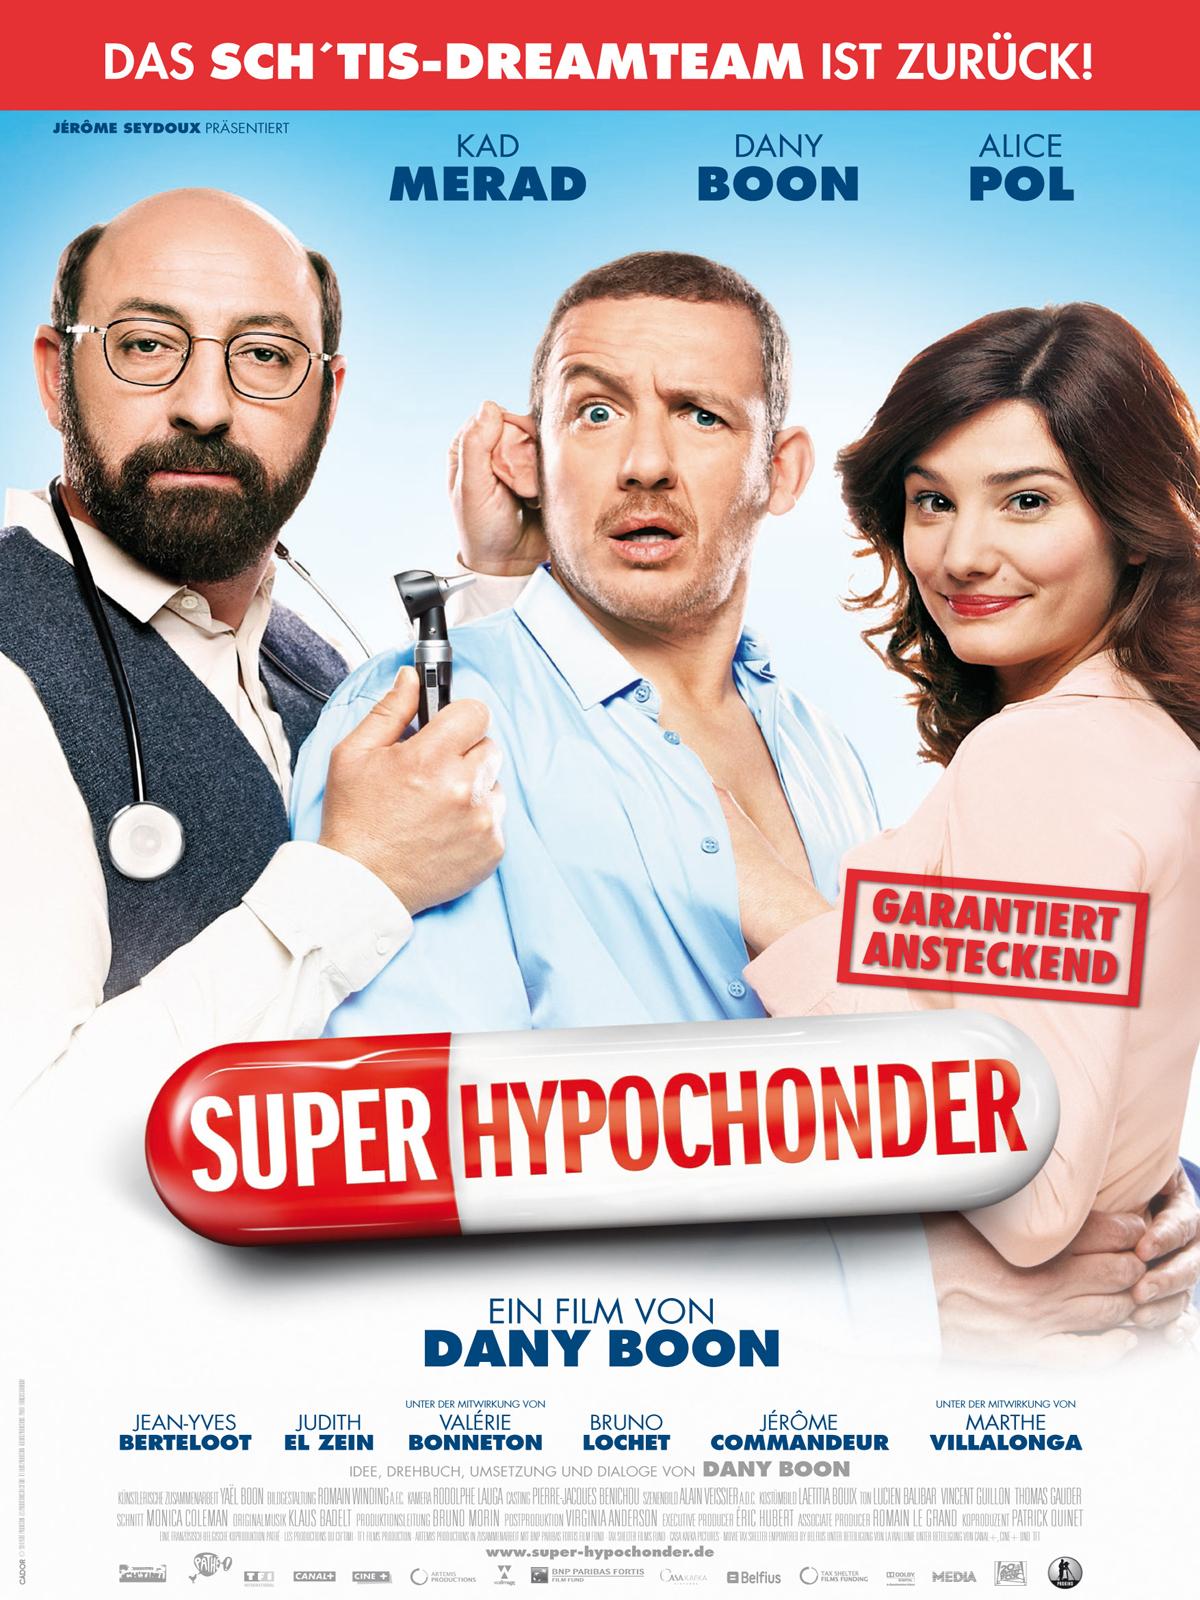 Super Hypochonder